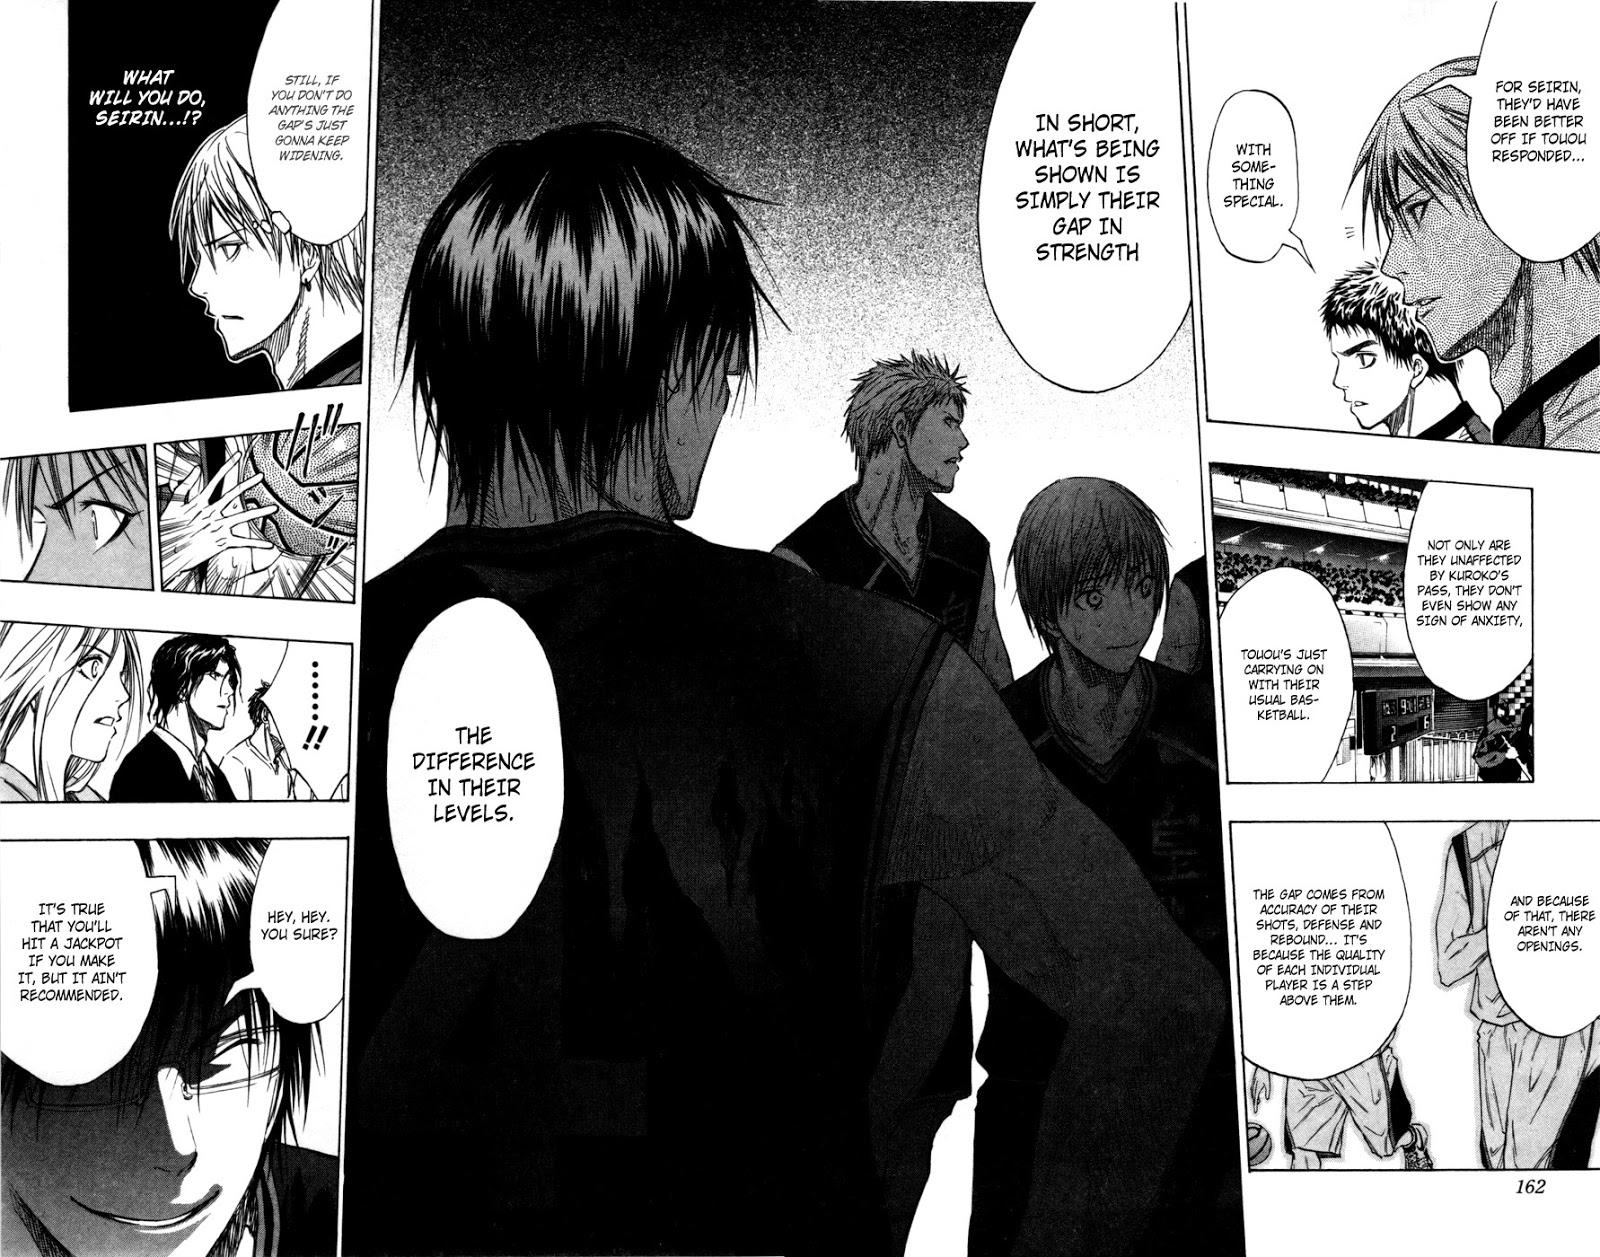 Kuroko no Basket Manga Chapter 116 - Image 15-16